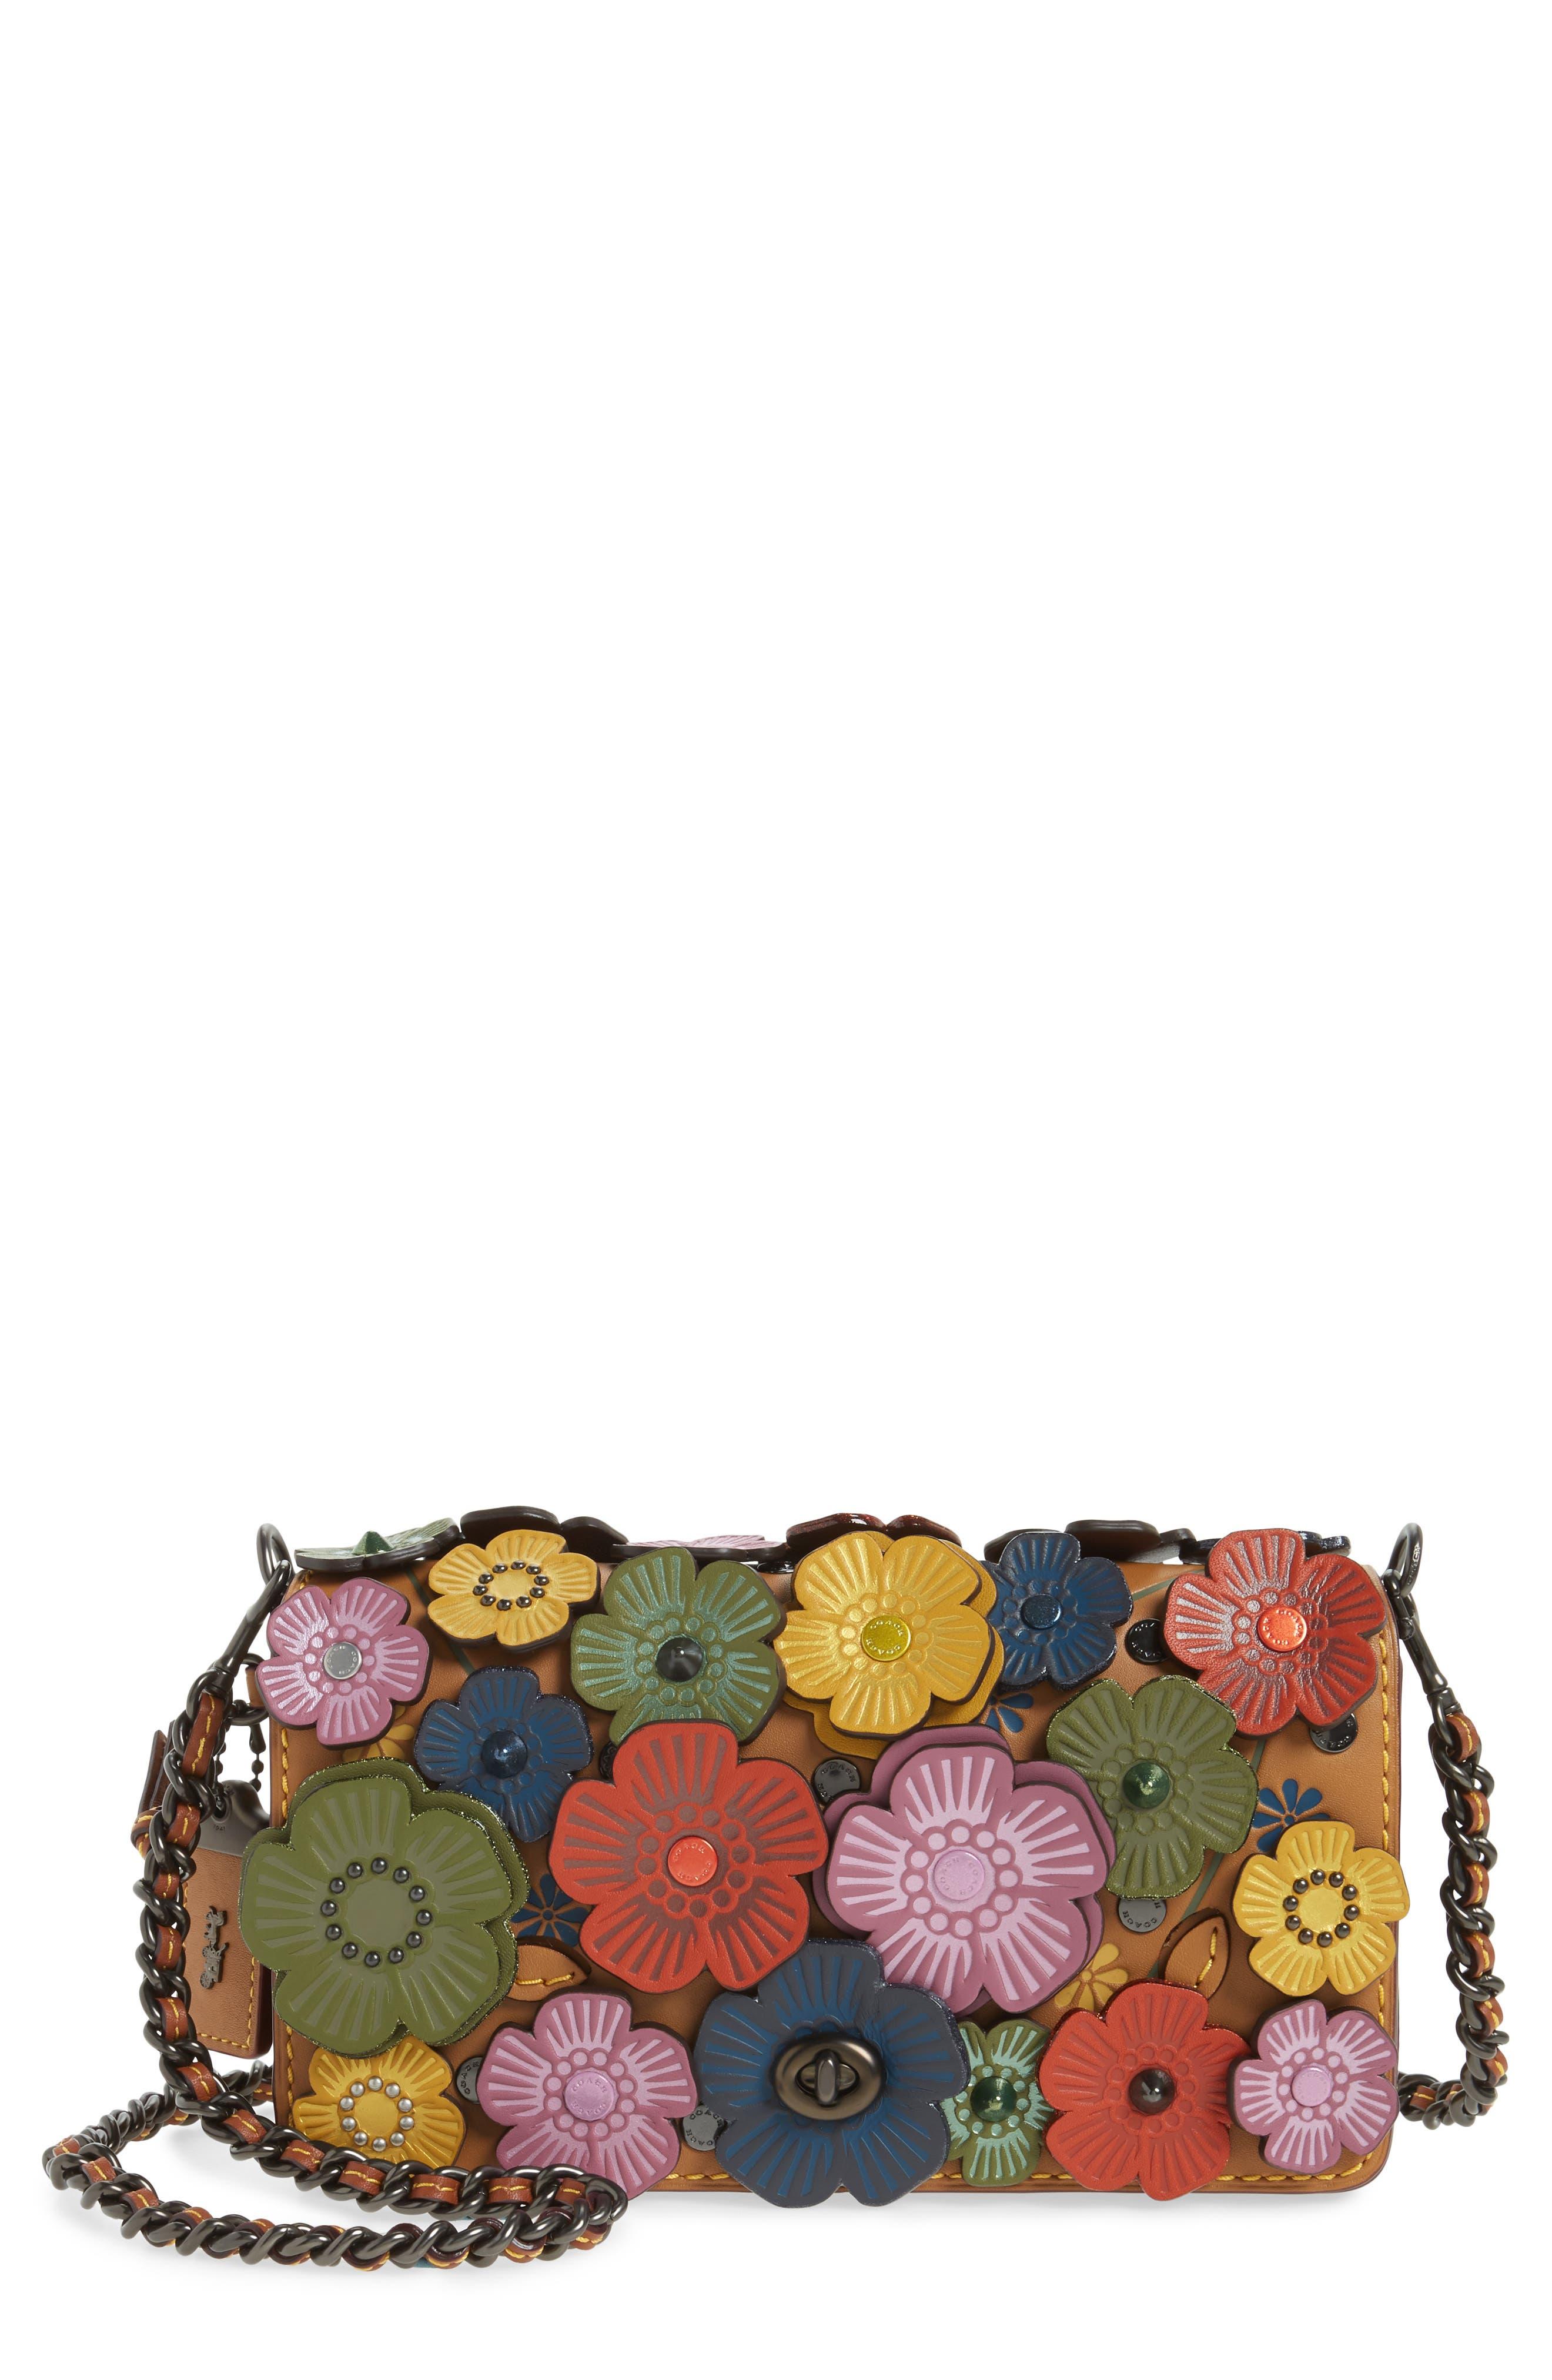 Main Image - COACH 1941 'Dinky' Flower Appliqué Leather Crossbody Bag